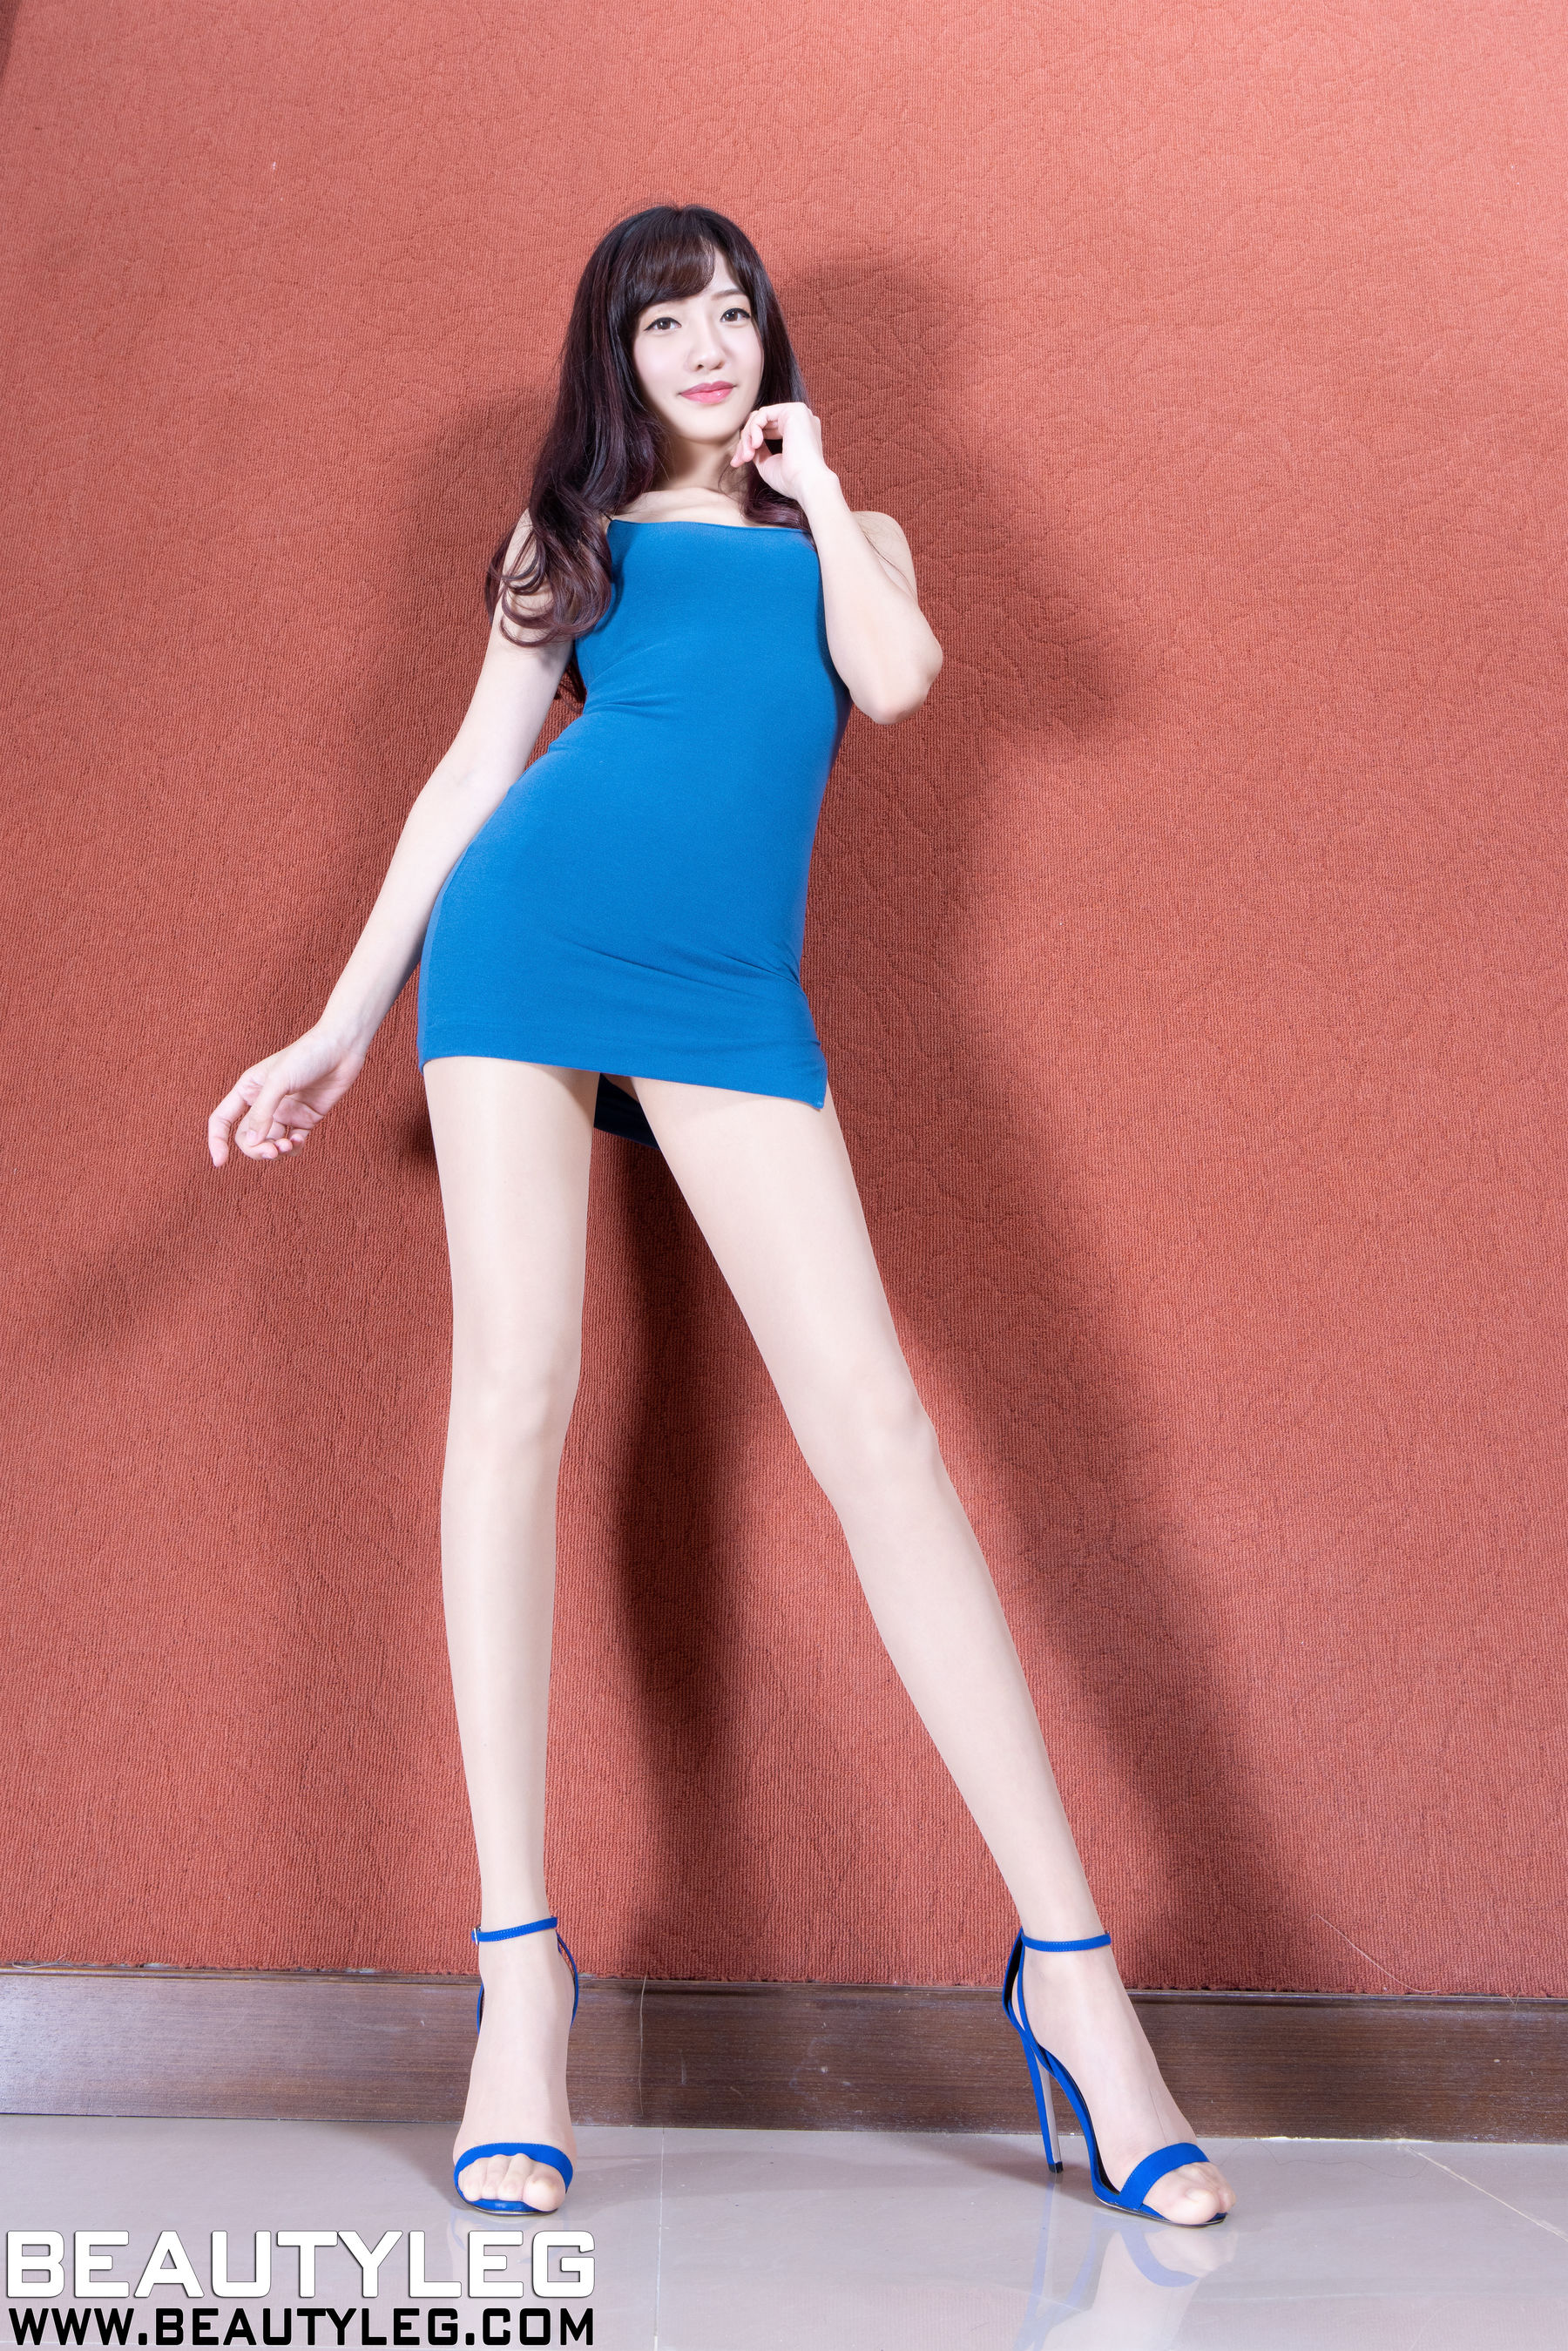 VOL.311 [Beautyleg]高跟美腿吊带:欣洁(腿模Celia)超高清个人性感漂亮大图(48P)